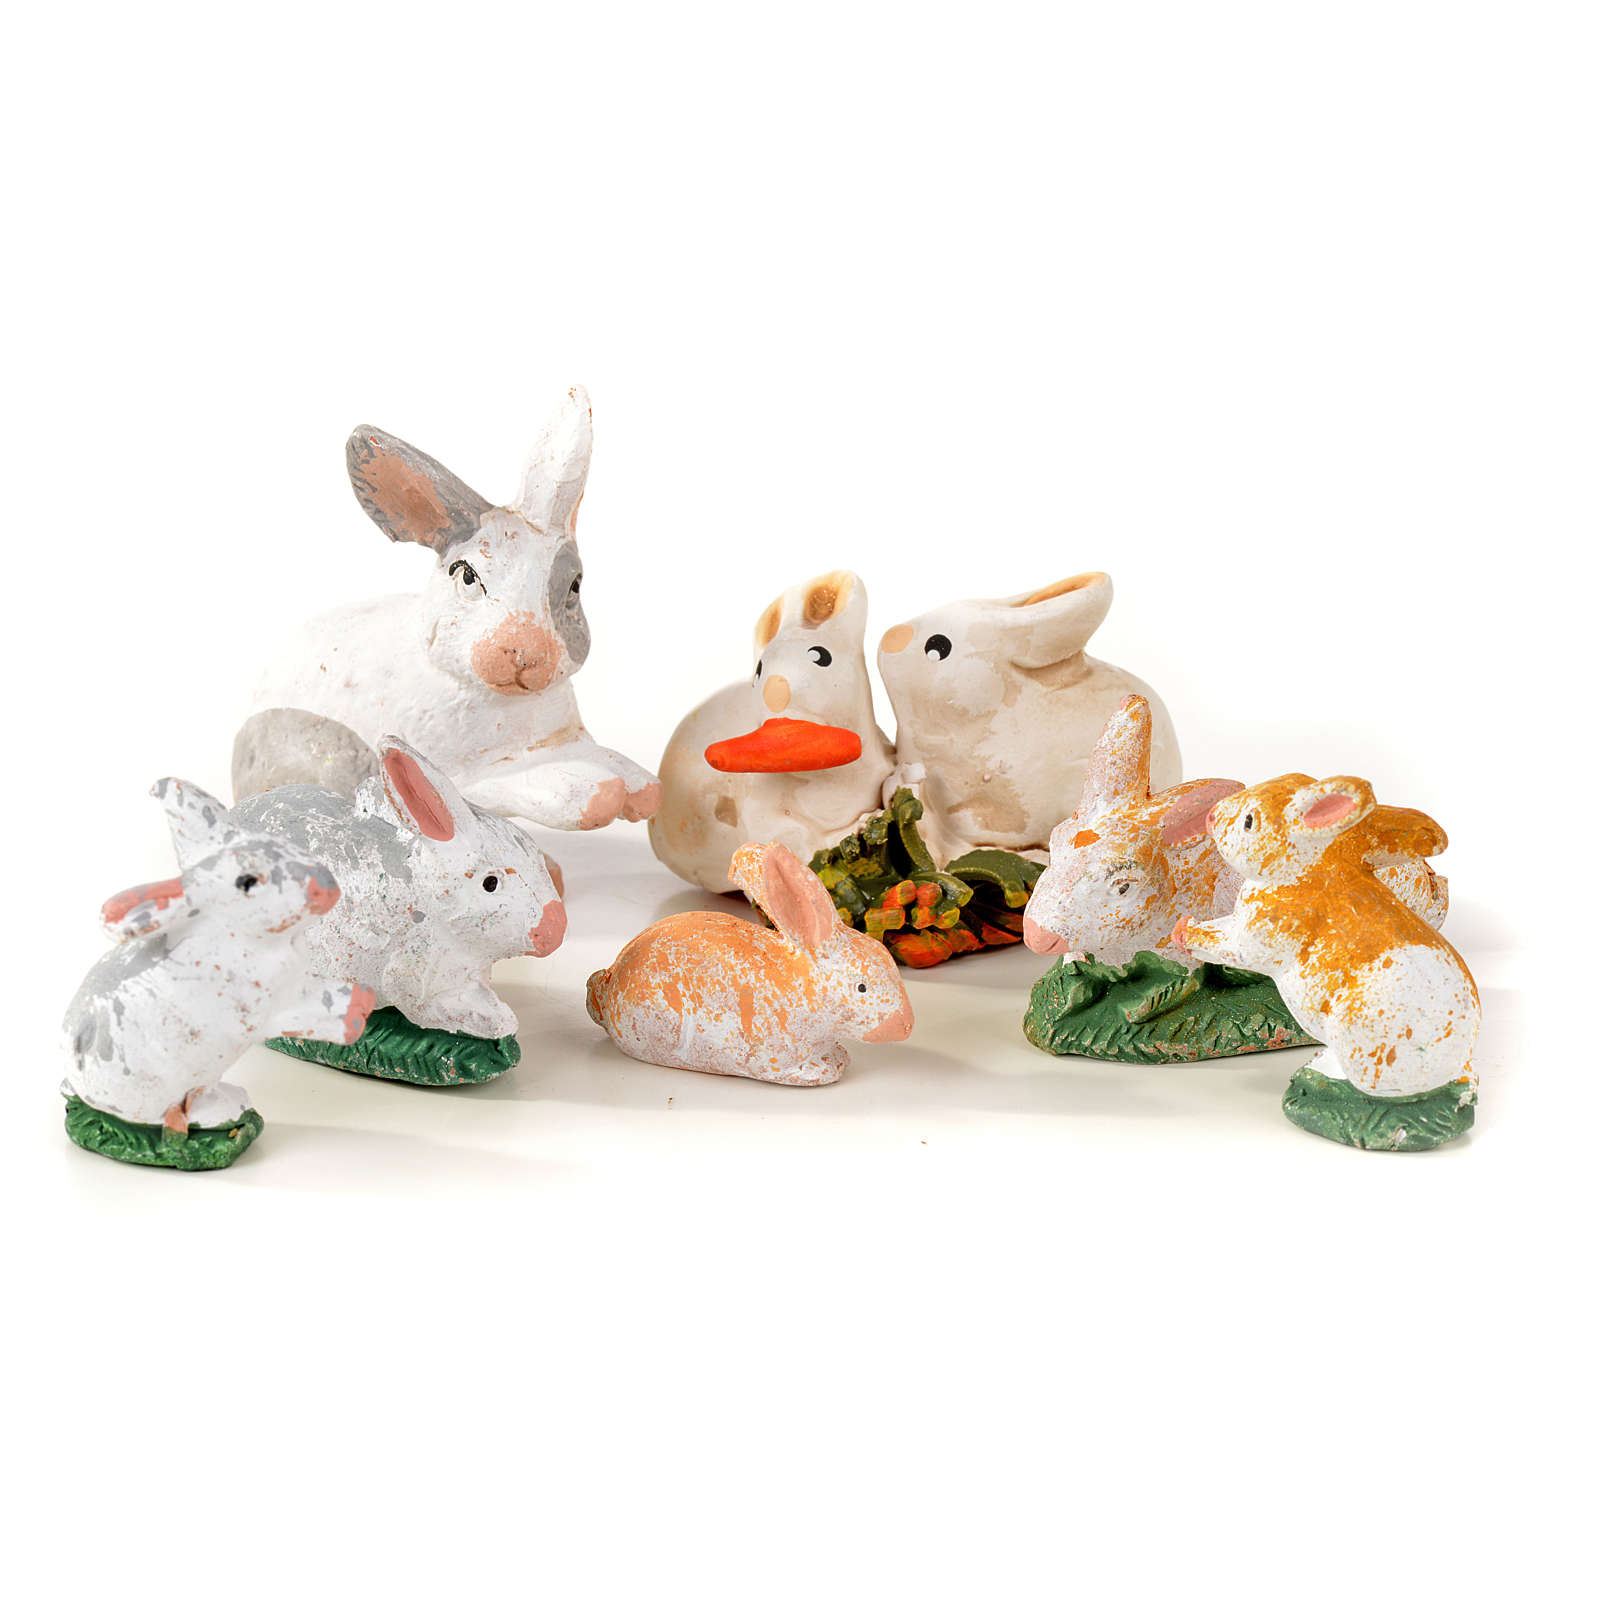 Neapolitan Nativity scene figurine, kit with rabbits, 7 pieces 8 4